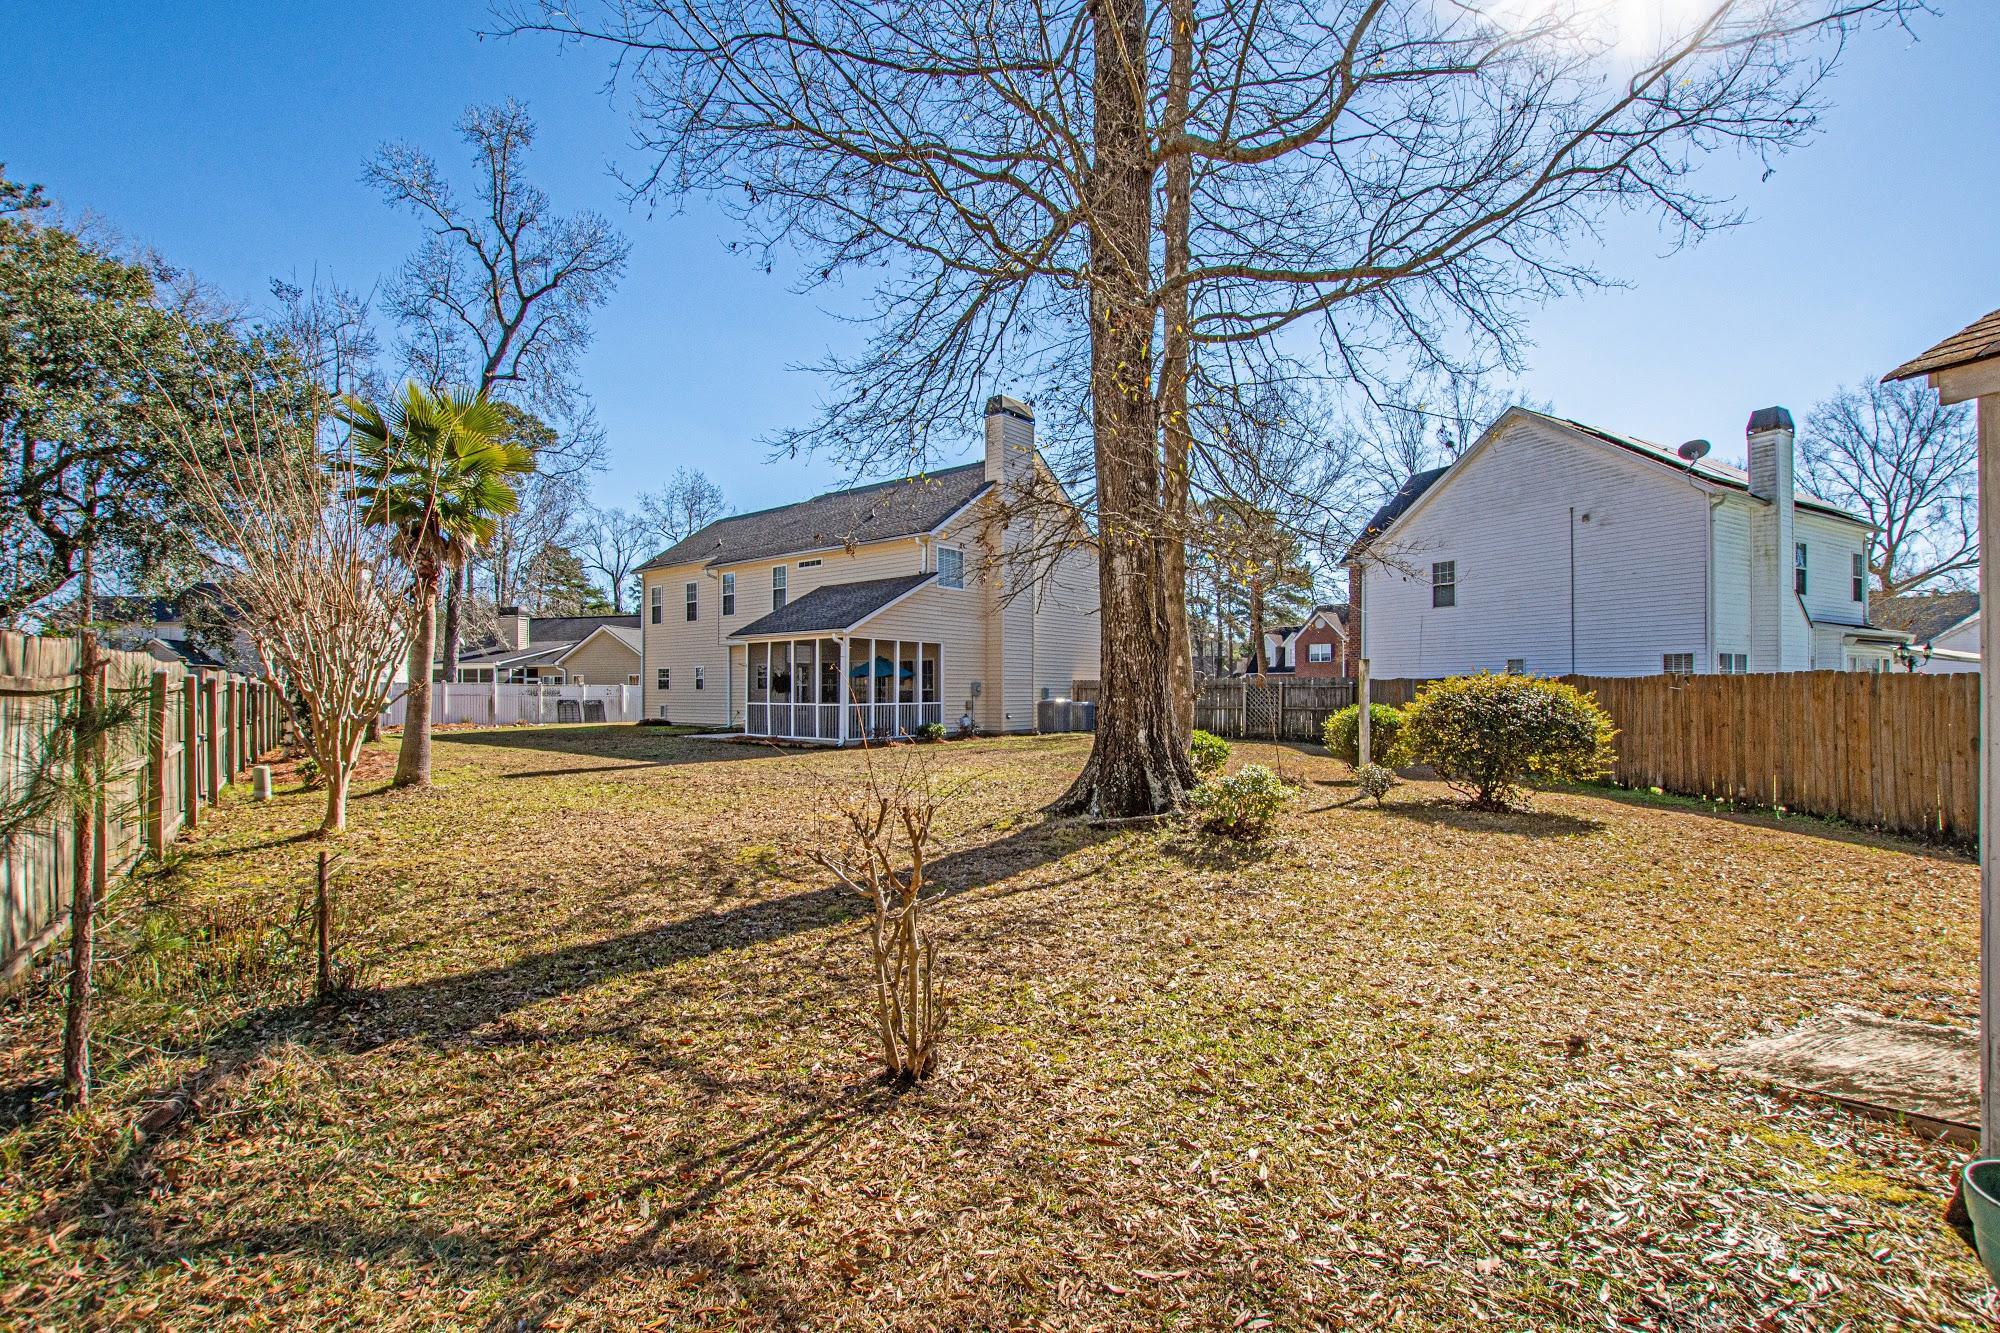 Indigo Fields Homes For Sale - 5512 Rowsham, North Charleston, SC - 2